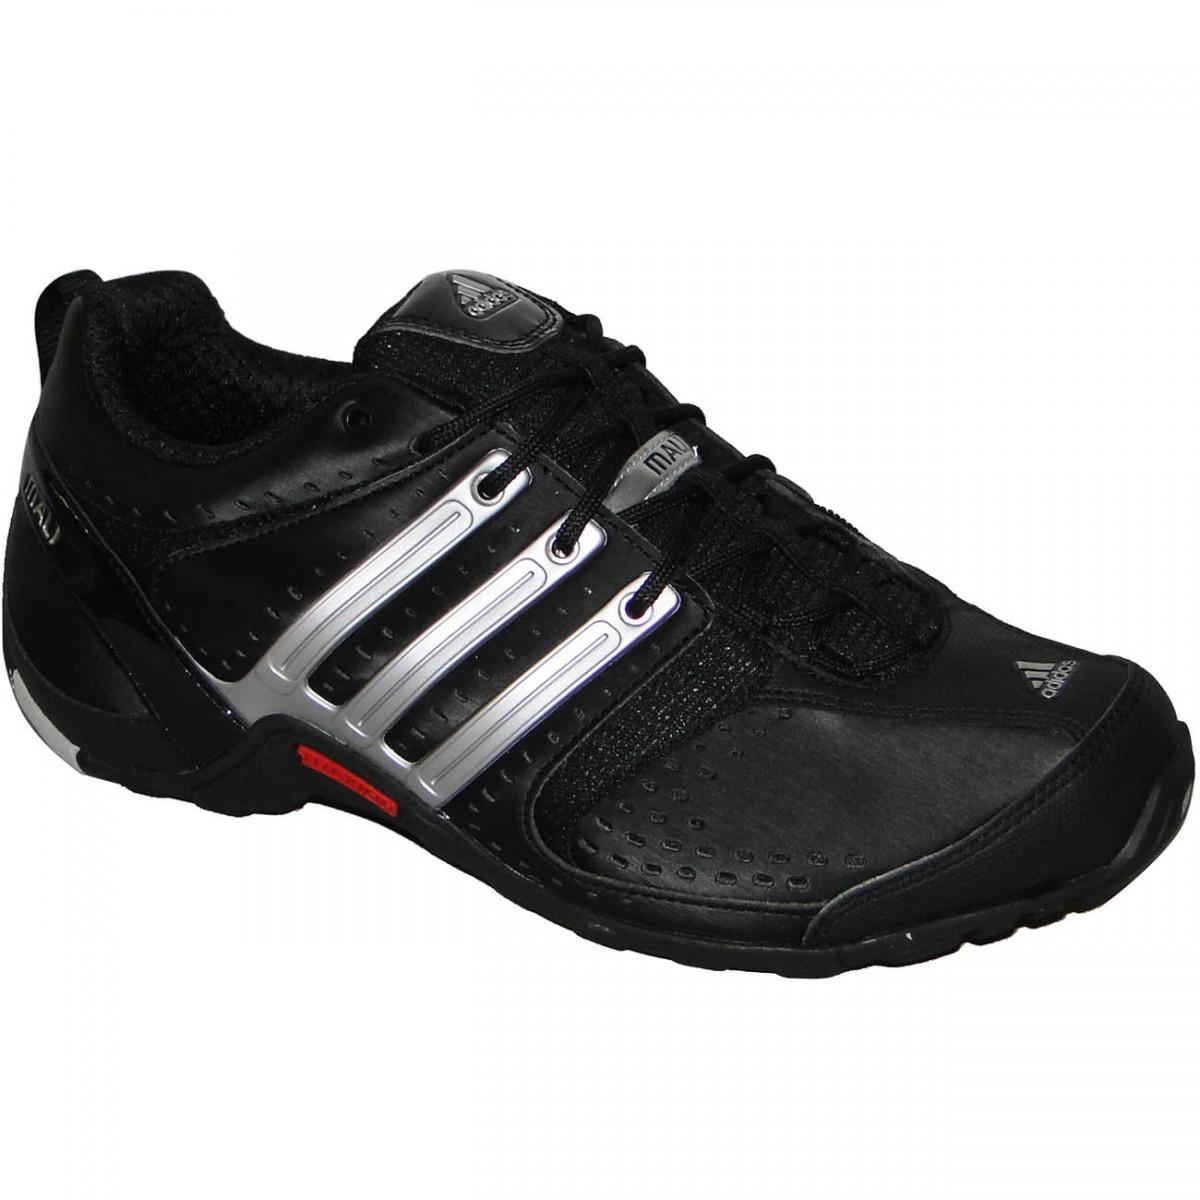 8d7b7257513 Tênis Adidas Mali 10 8356 - PRETO PRATA - Chuteira Nike